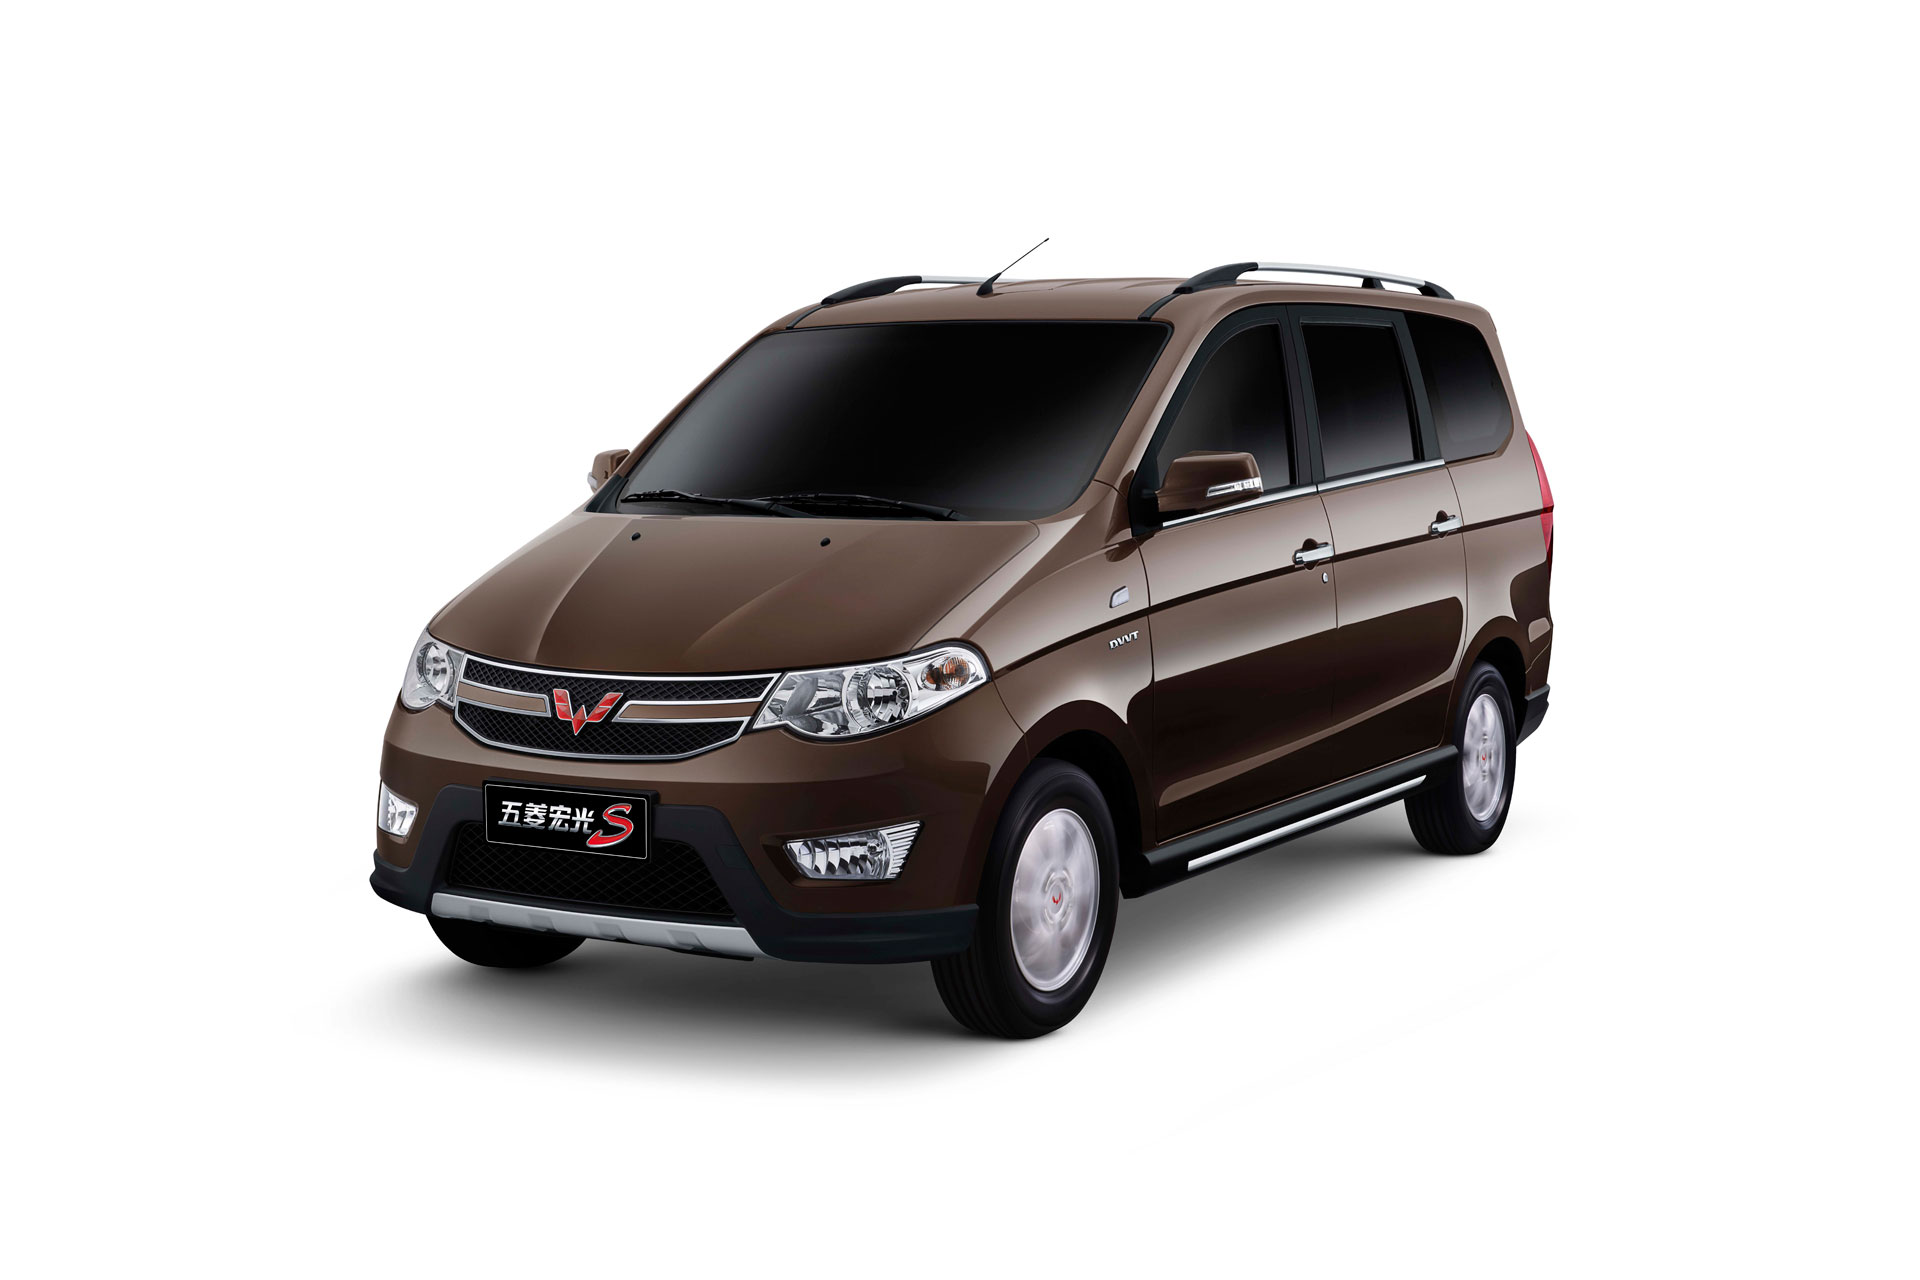 Mitsubishi Mirage 2017 Price >> 2015 Wuling Hongguang S Image. http://www.conceptcarz.com/images/Wuling/Wuling-Hongguang-S_image ...